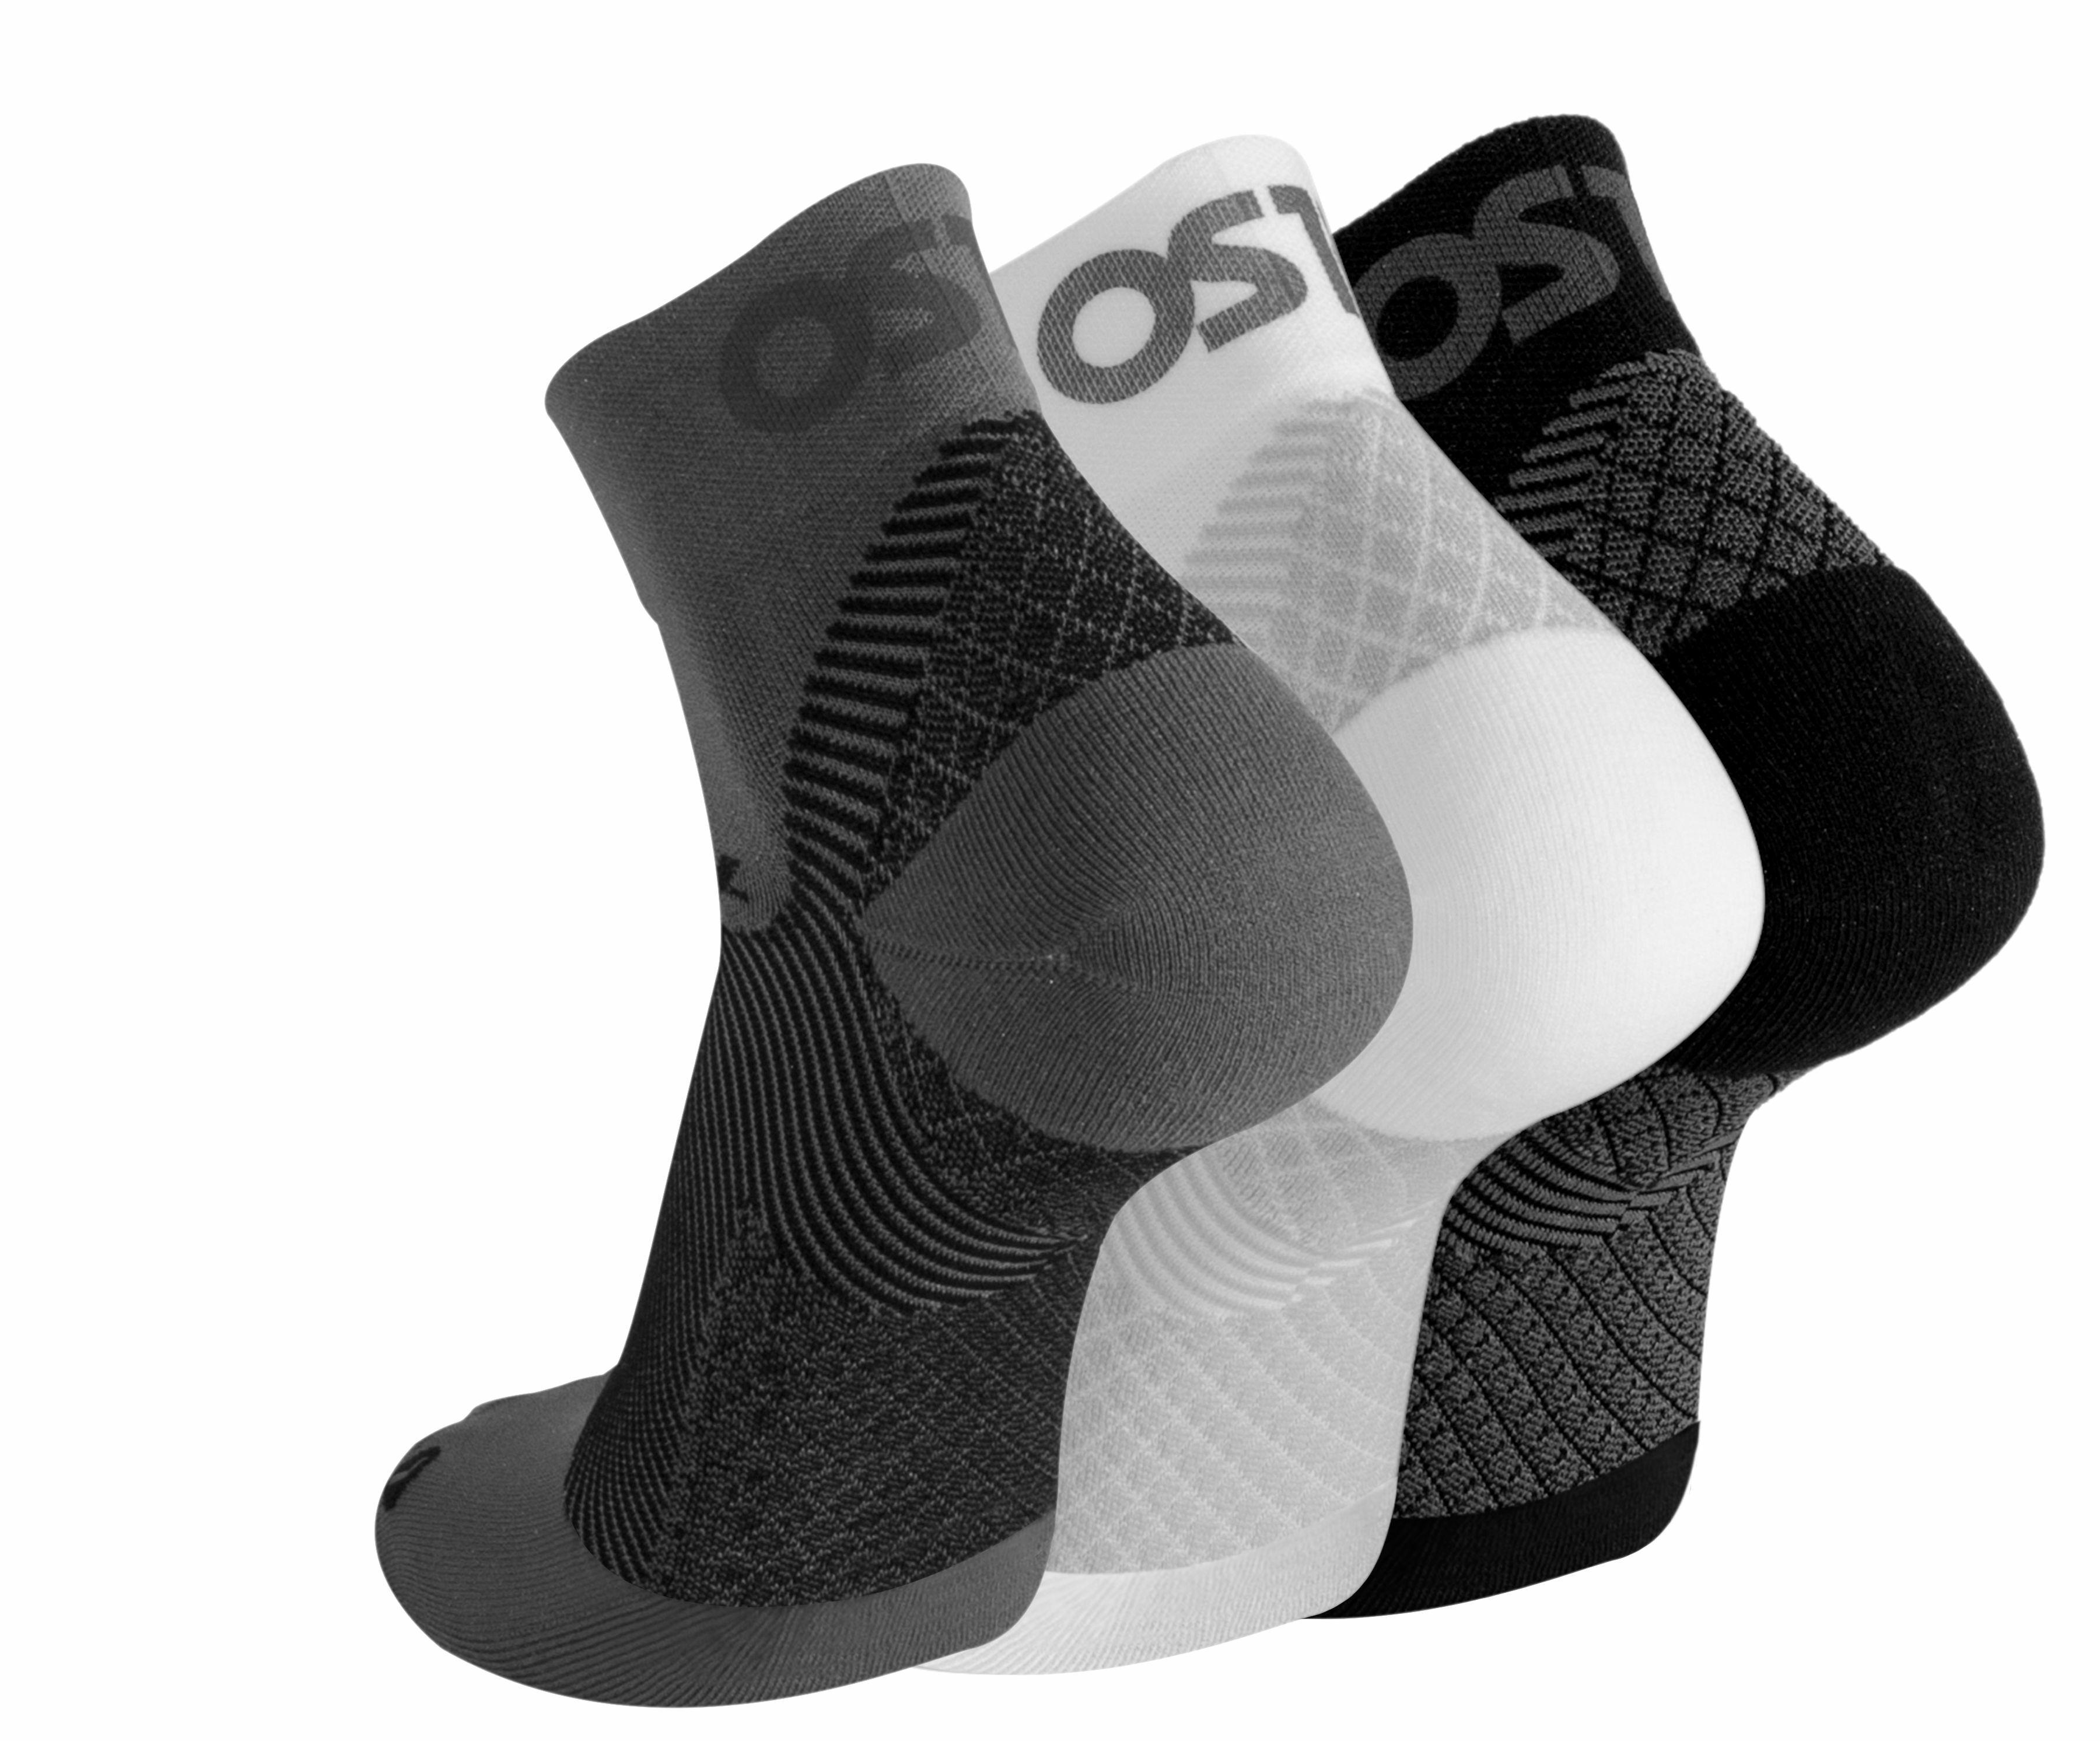 FS4 Plantar Fasciitis Quarter Crew Socks 100-021